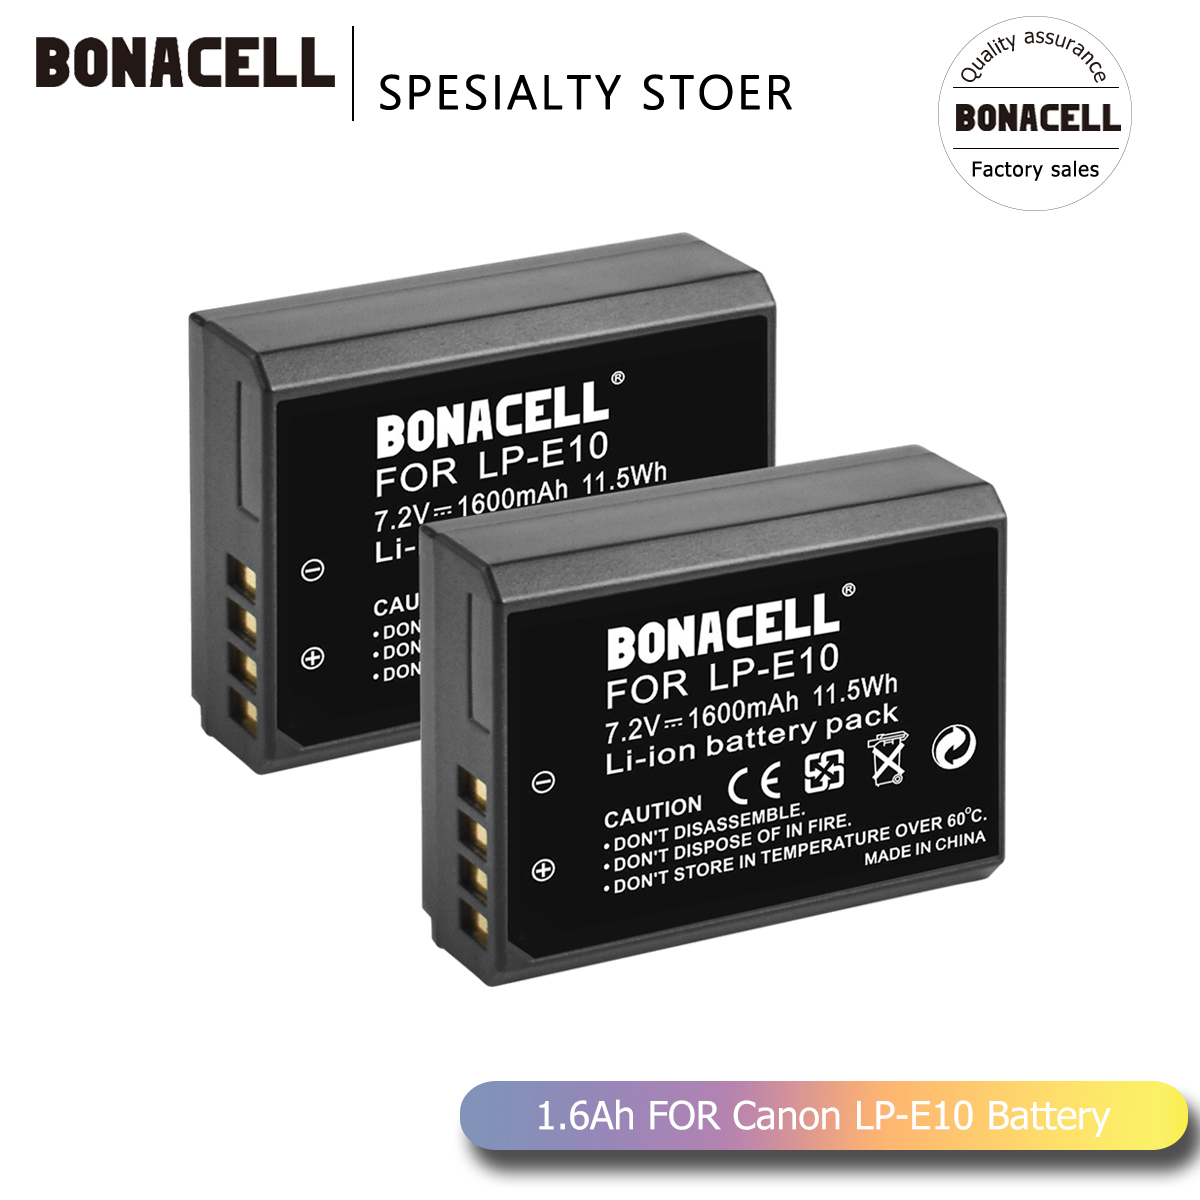 Bonacell 1600mAh LP-E10 LP E10 LPE10 Digital Camera Battery For Canon 1100D 1200D 1300D Rebel T3 T5 KISS X50 X70 Battery L50